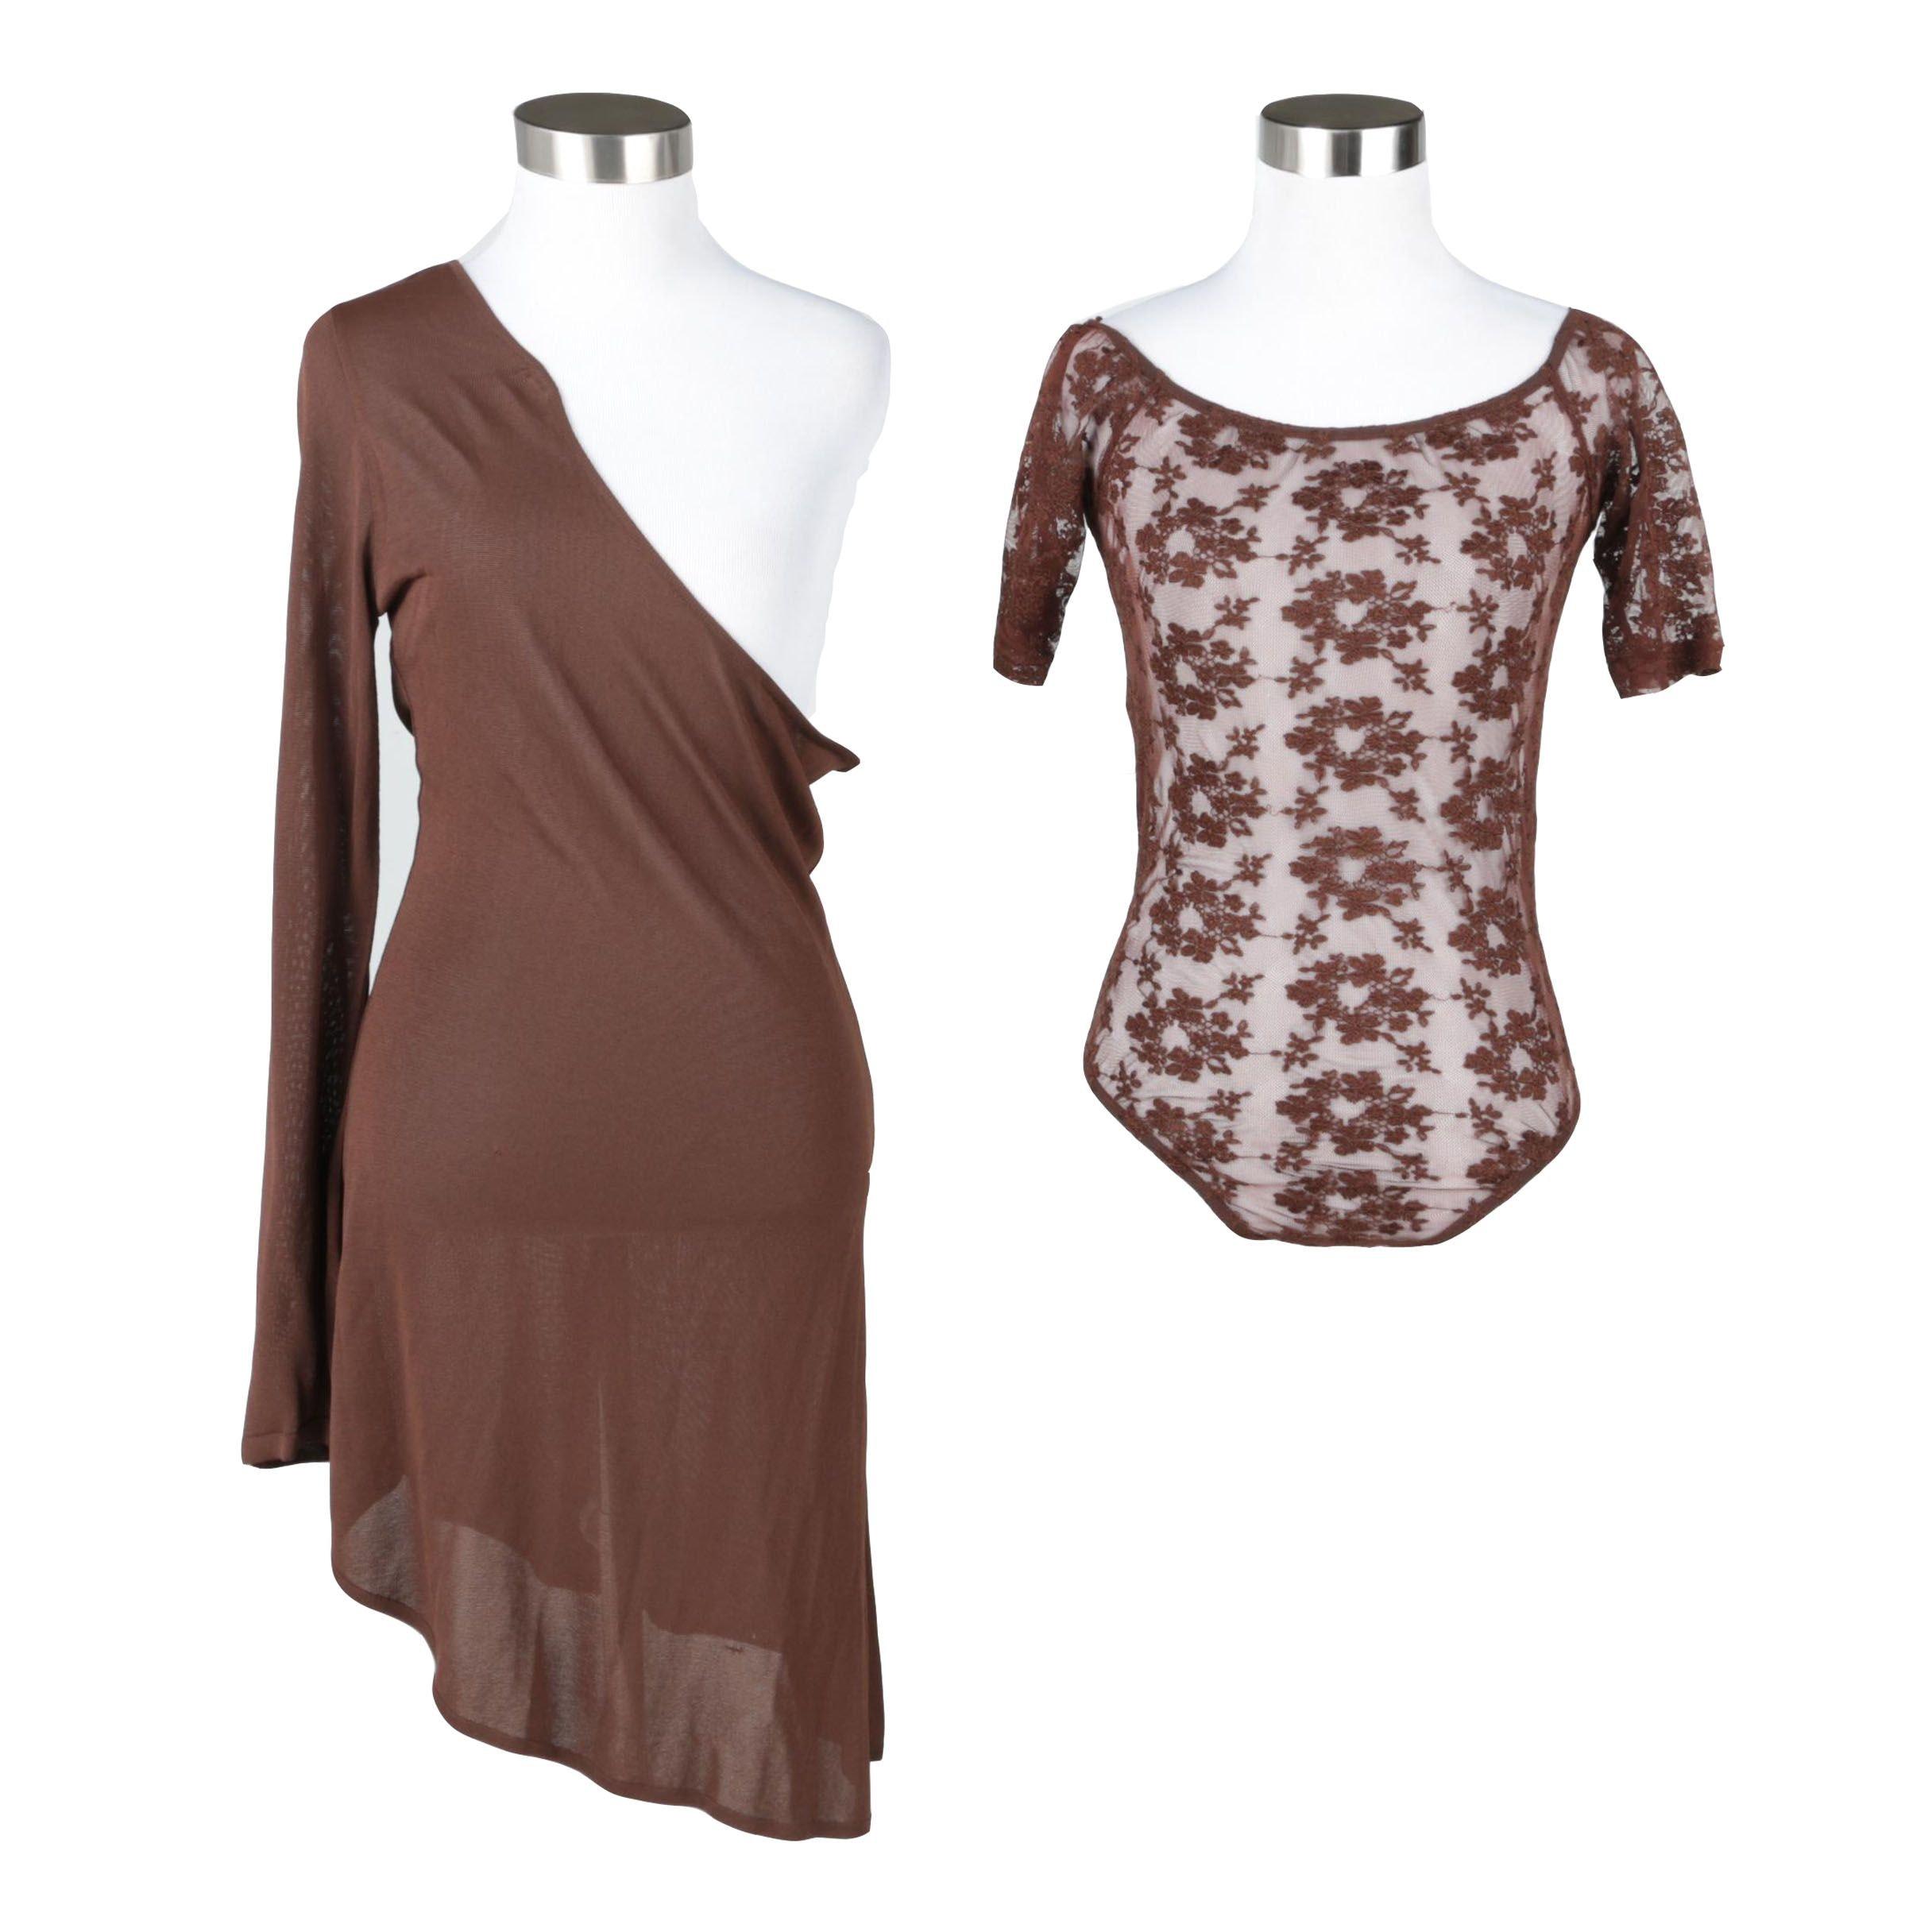 Alberta Ferretti Cocktail Dress and Uzbek Lace Bodysuit